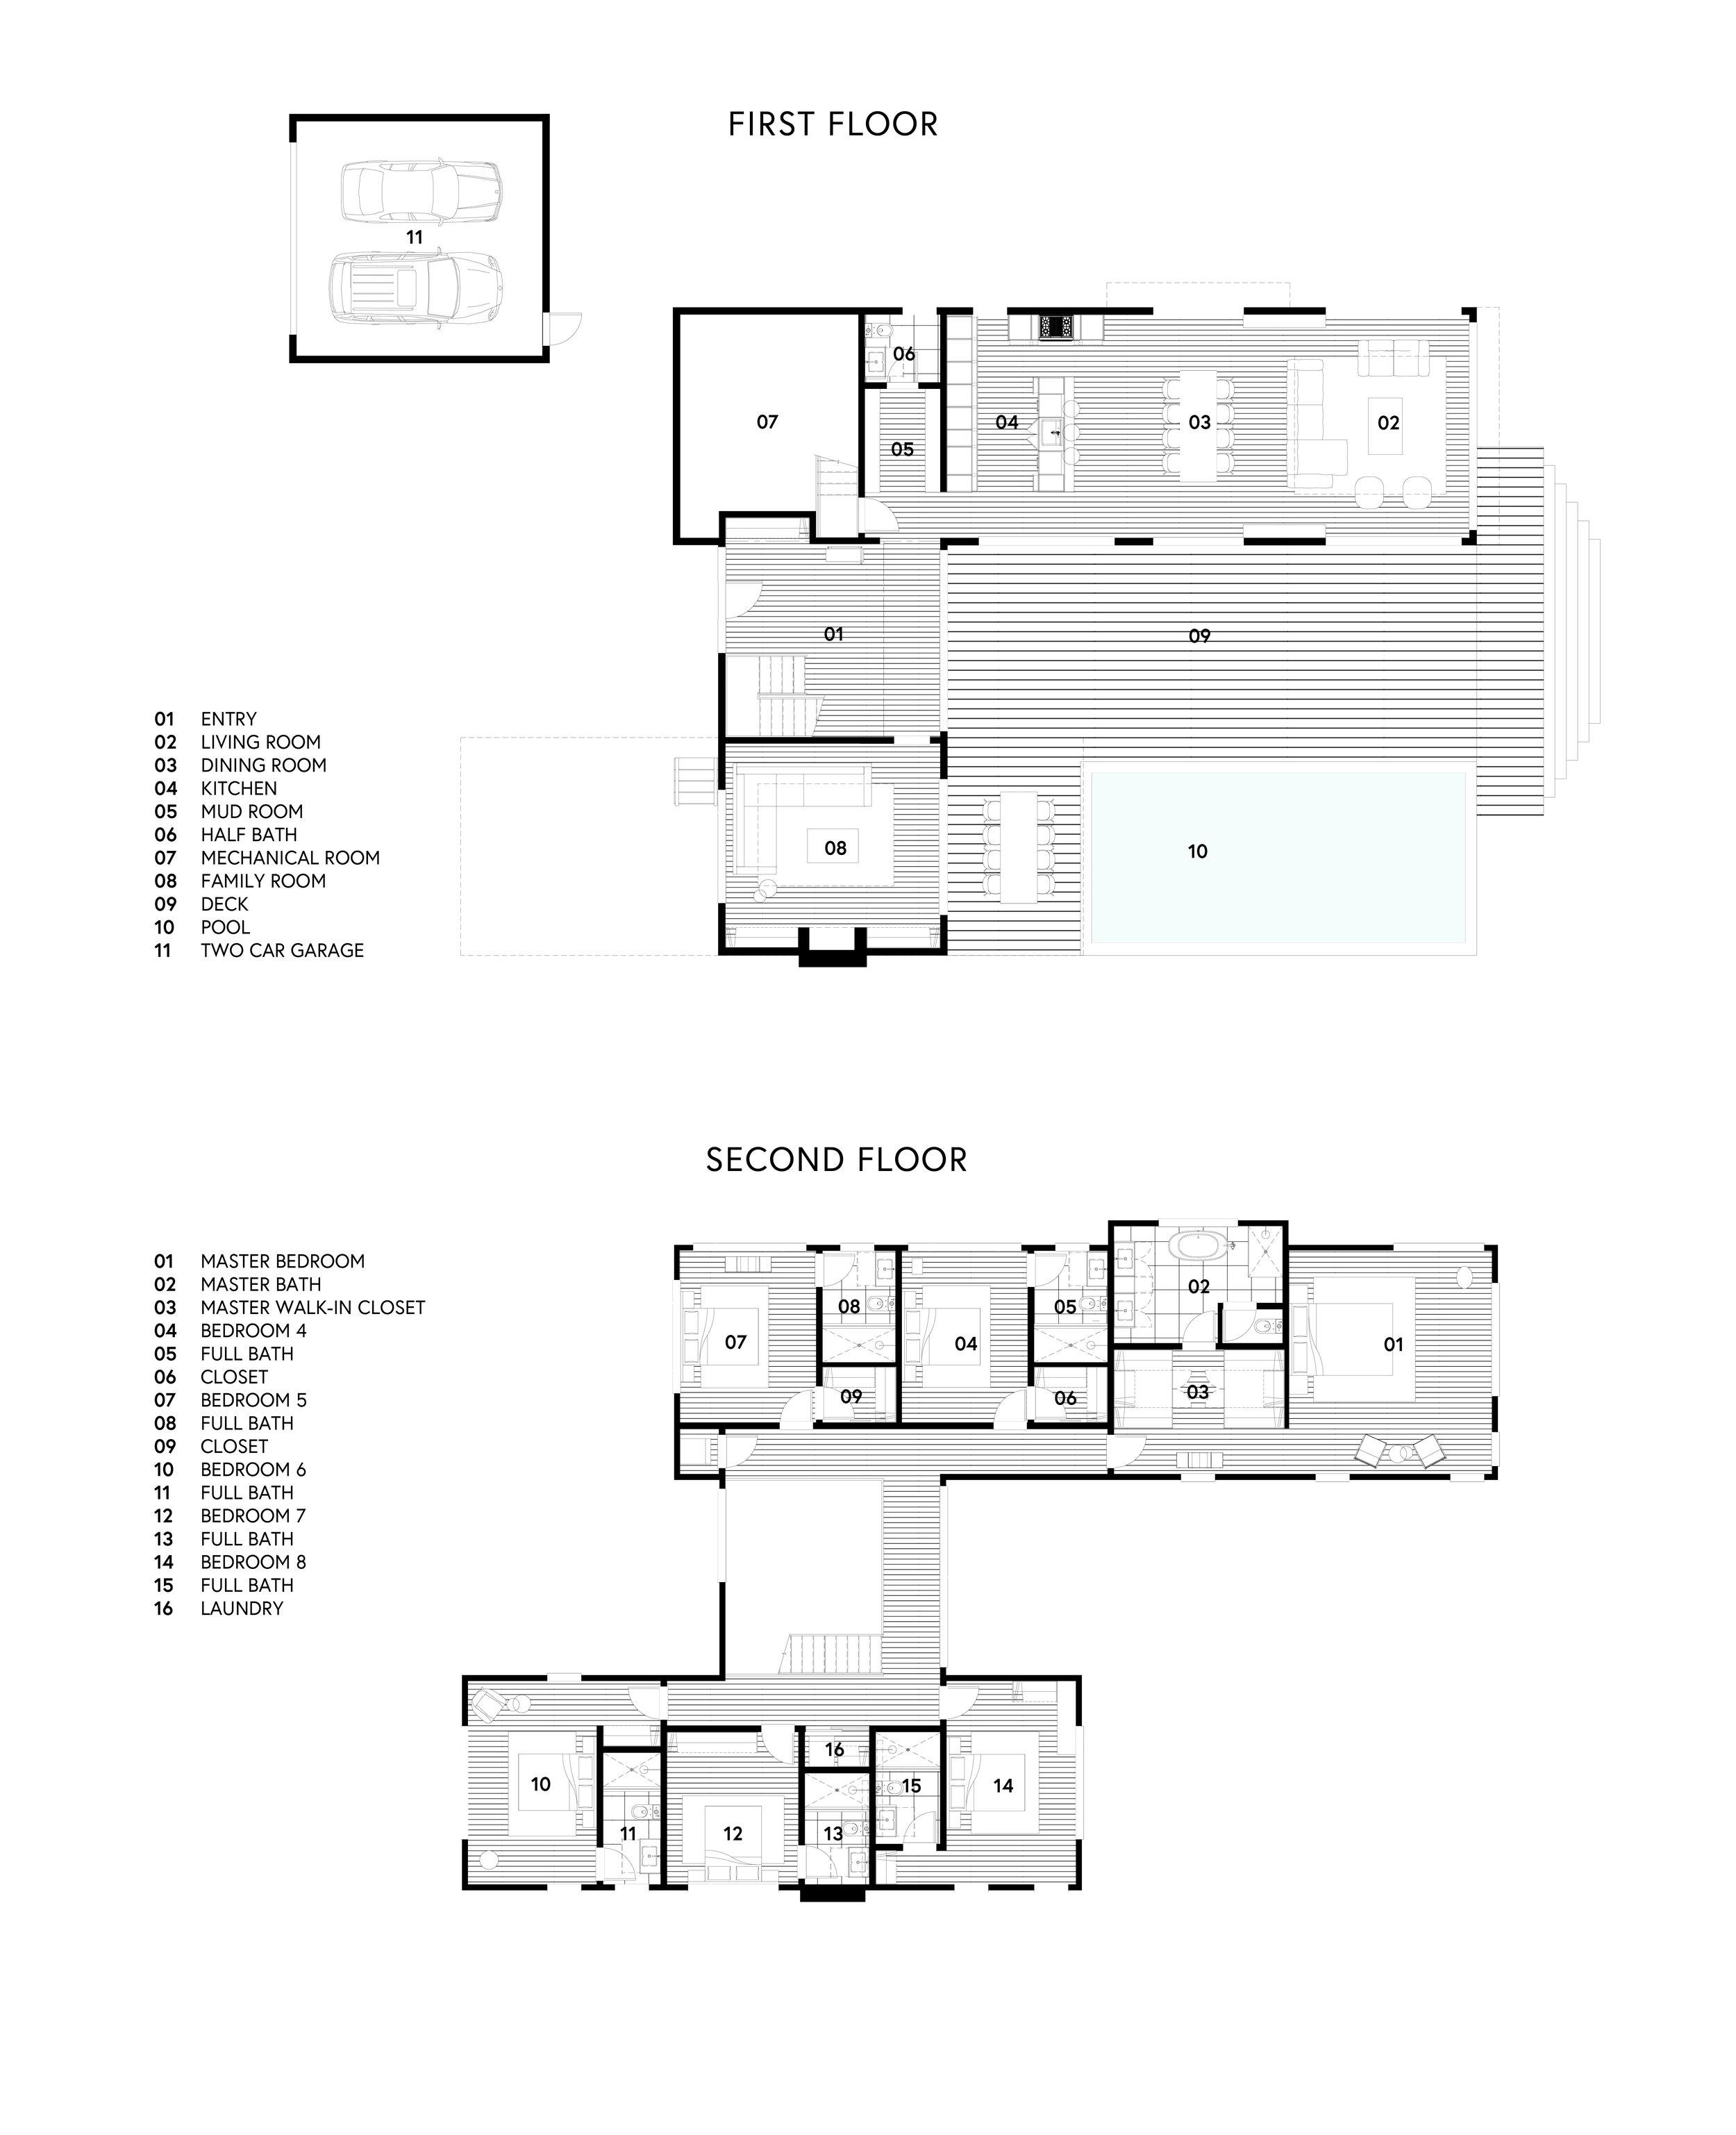 190808_Atelier by SZ Website_Atelier 391_Floor Plans.jpg